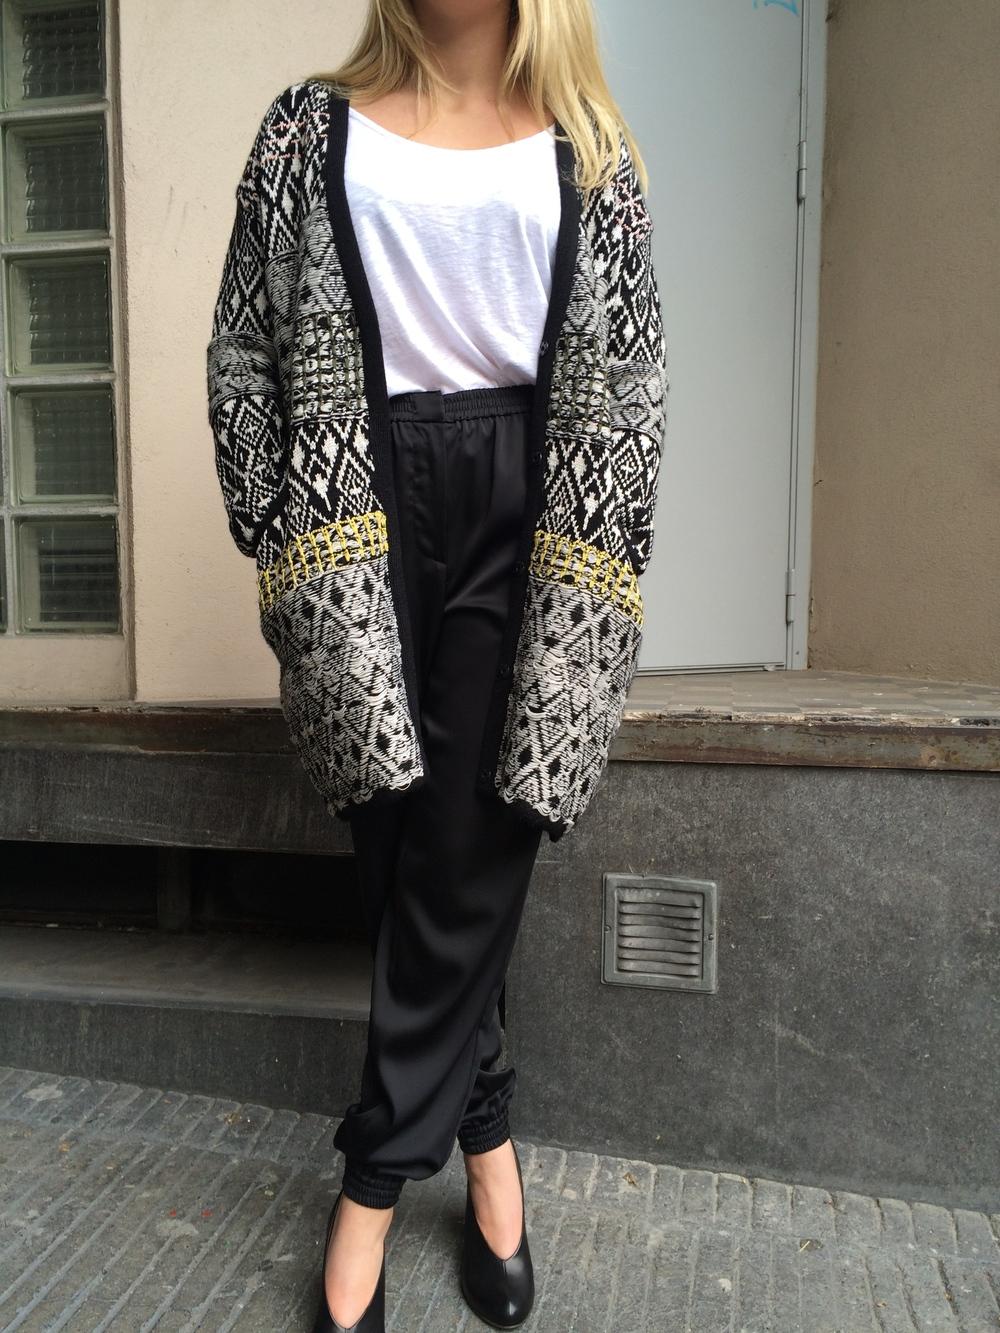 Silhouette Paradigme/ Pantalon CEDRIC CHARLIER/ Top VELVET/ Long gilet CHRISTIAN WIJNANTS/ Escarpins COCLICO.